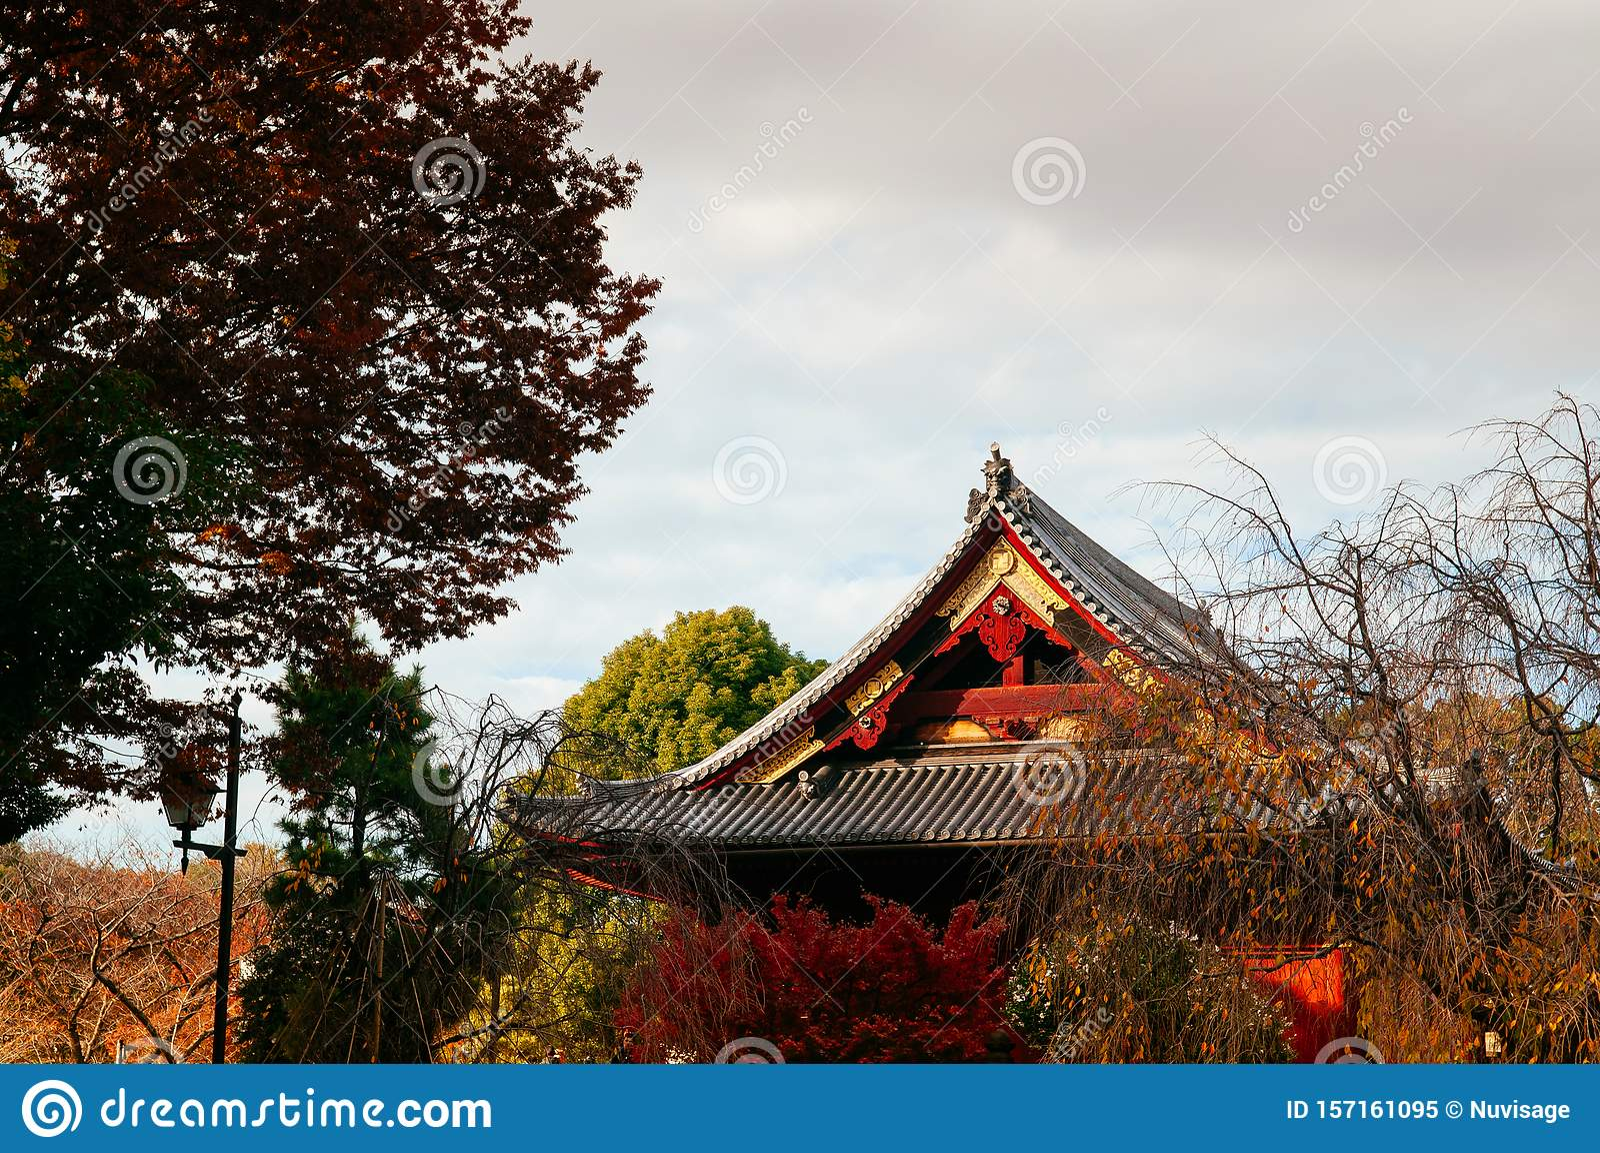 Old red wooden building of Kiyomizu Kannon-do shrine in Ueno park, Tokyo in autumn